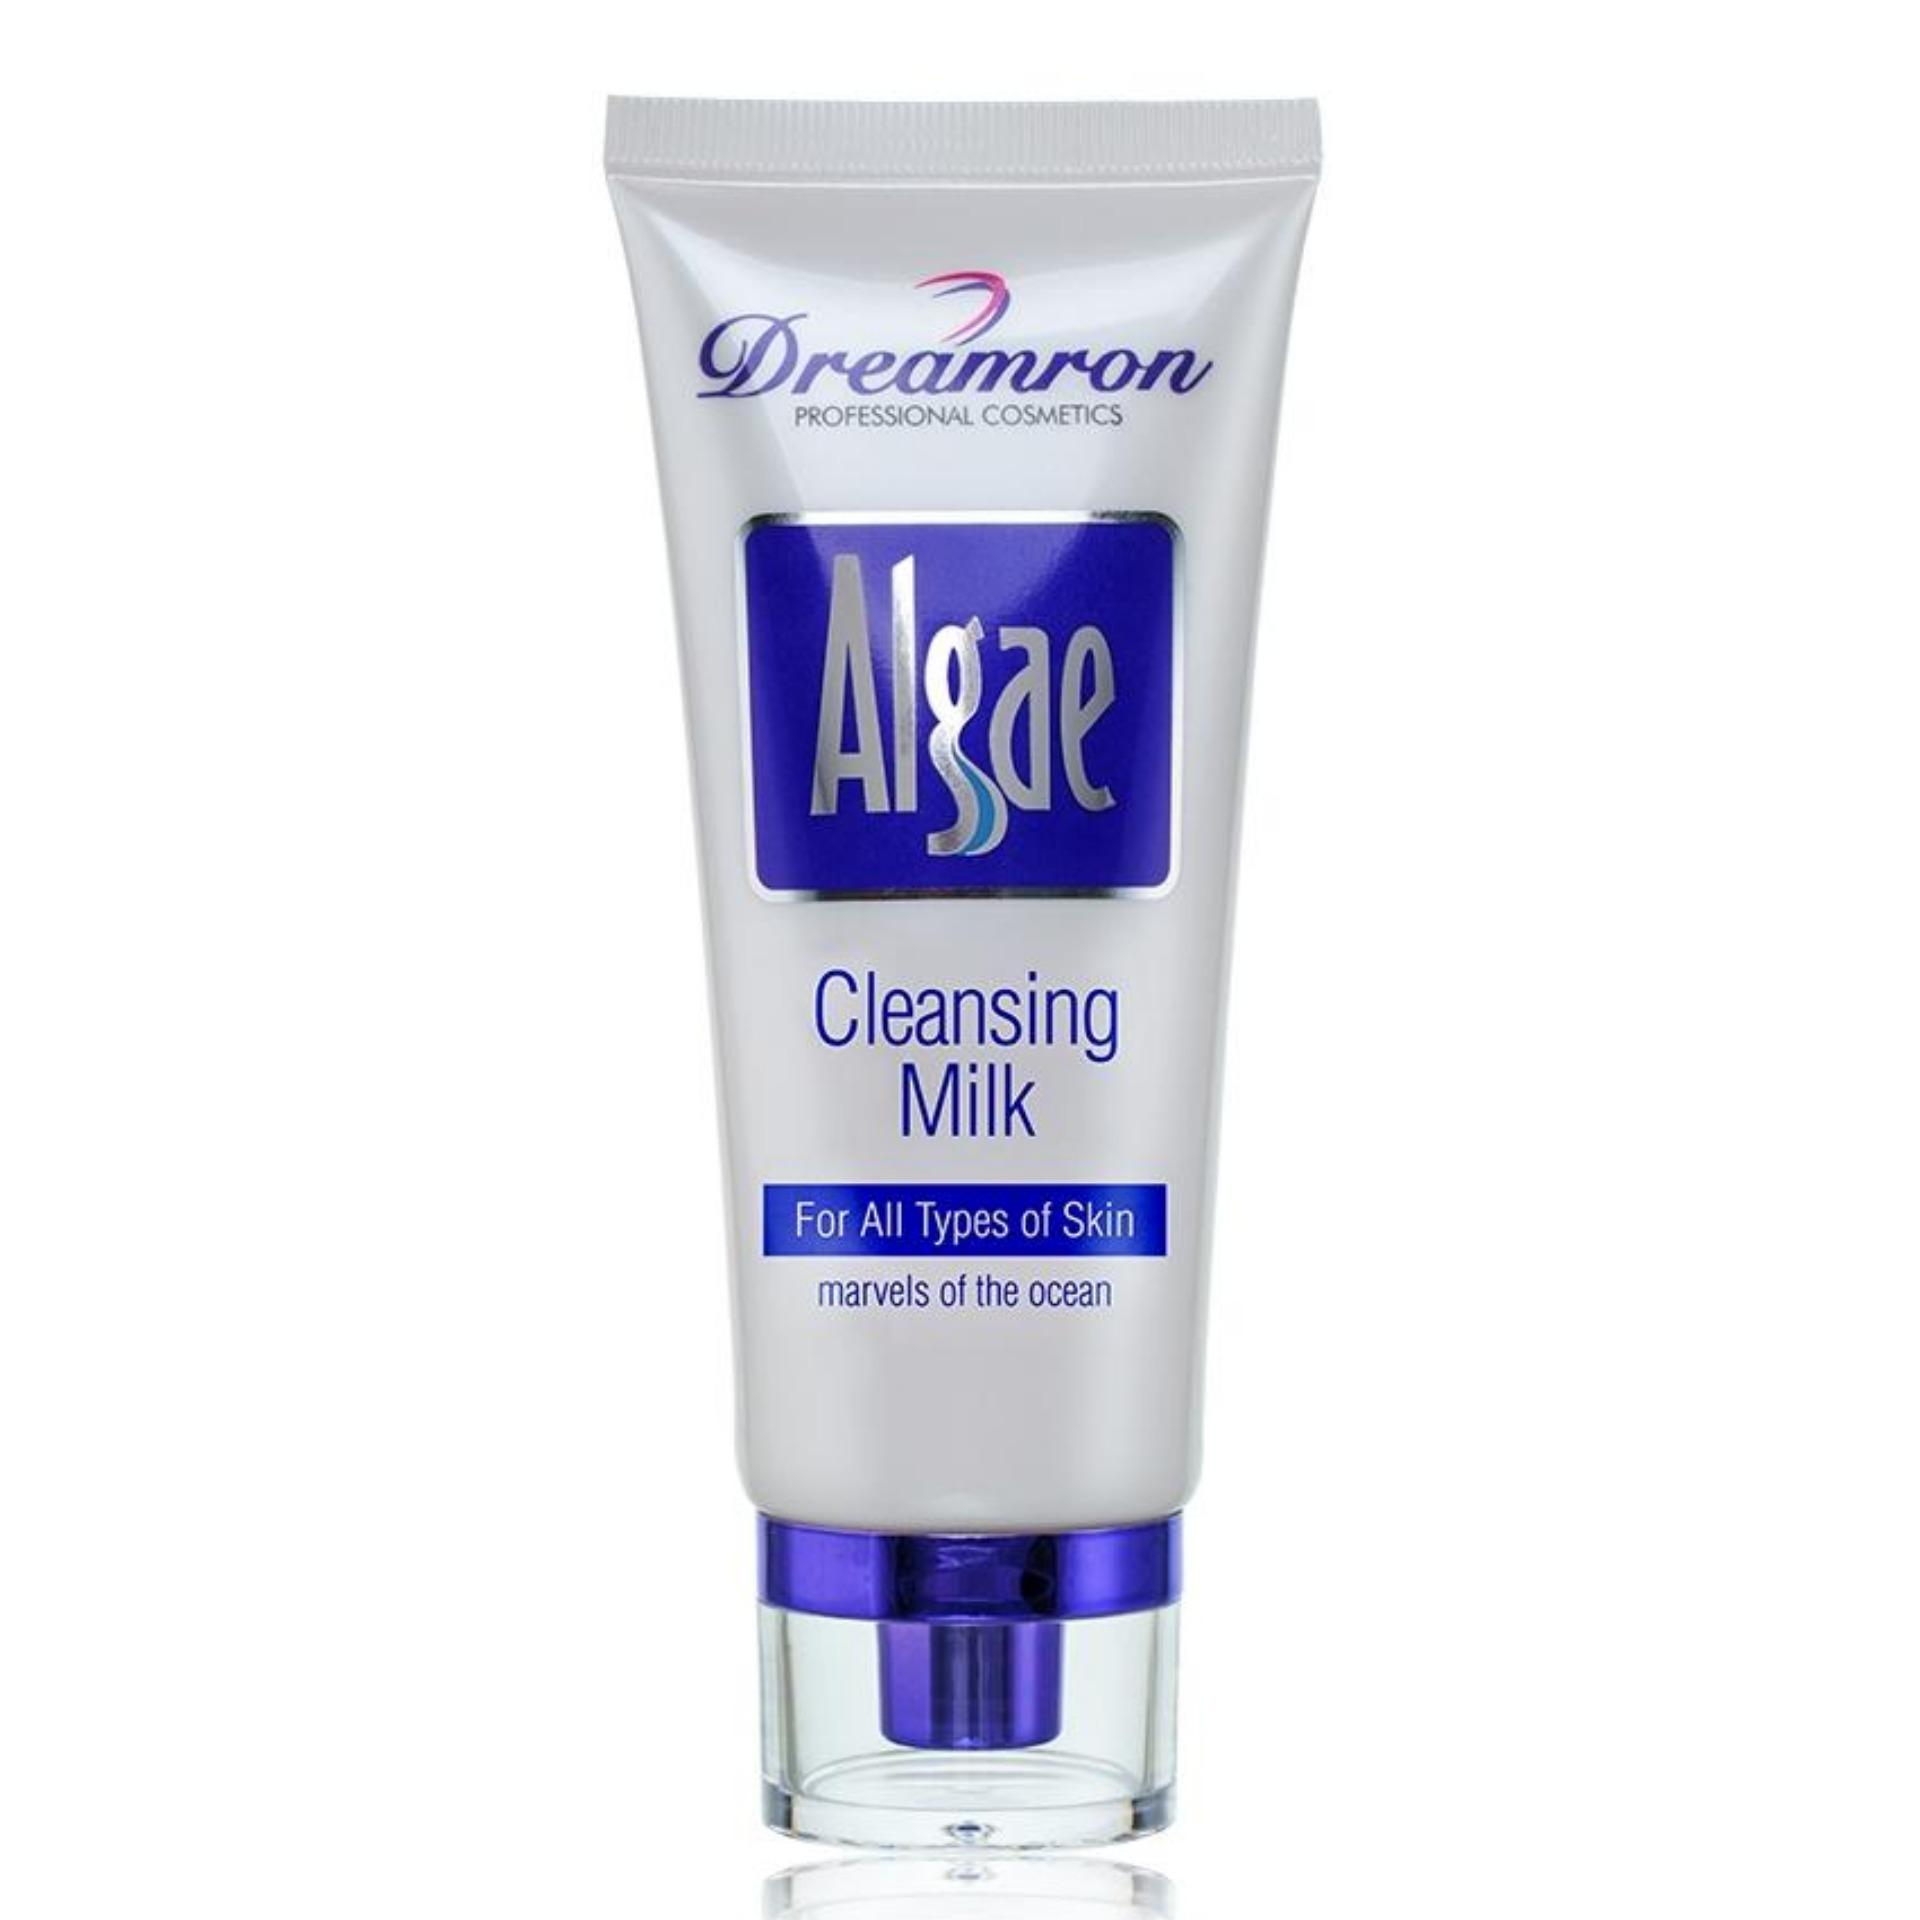 Sữa rửa mặt Dreamron Algae Cleansing Milk 100ml giúp dưỡng trắng da tốt nhất